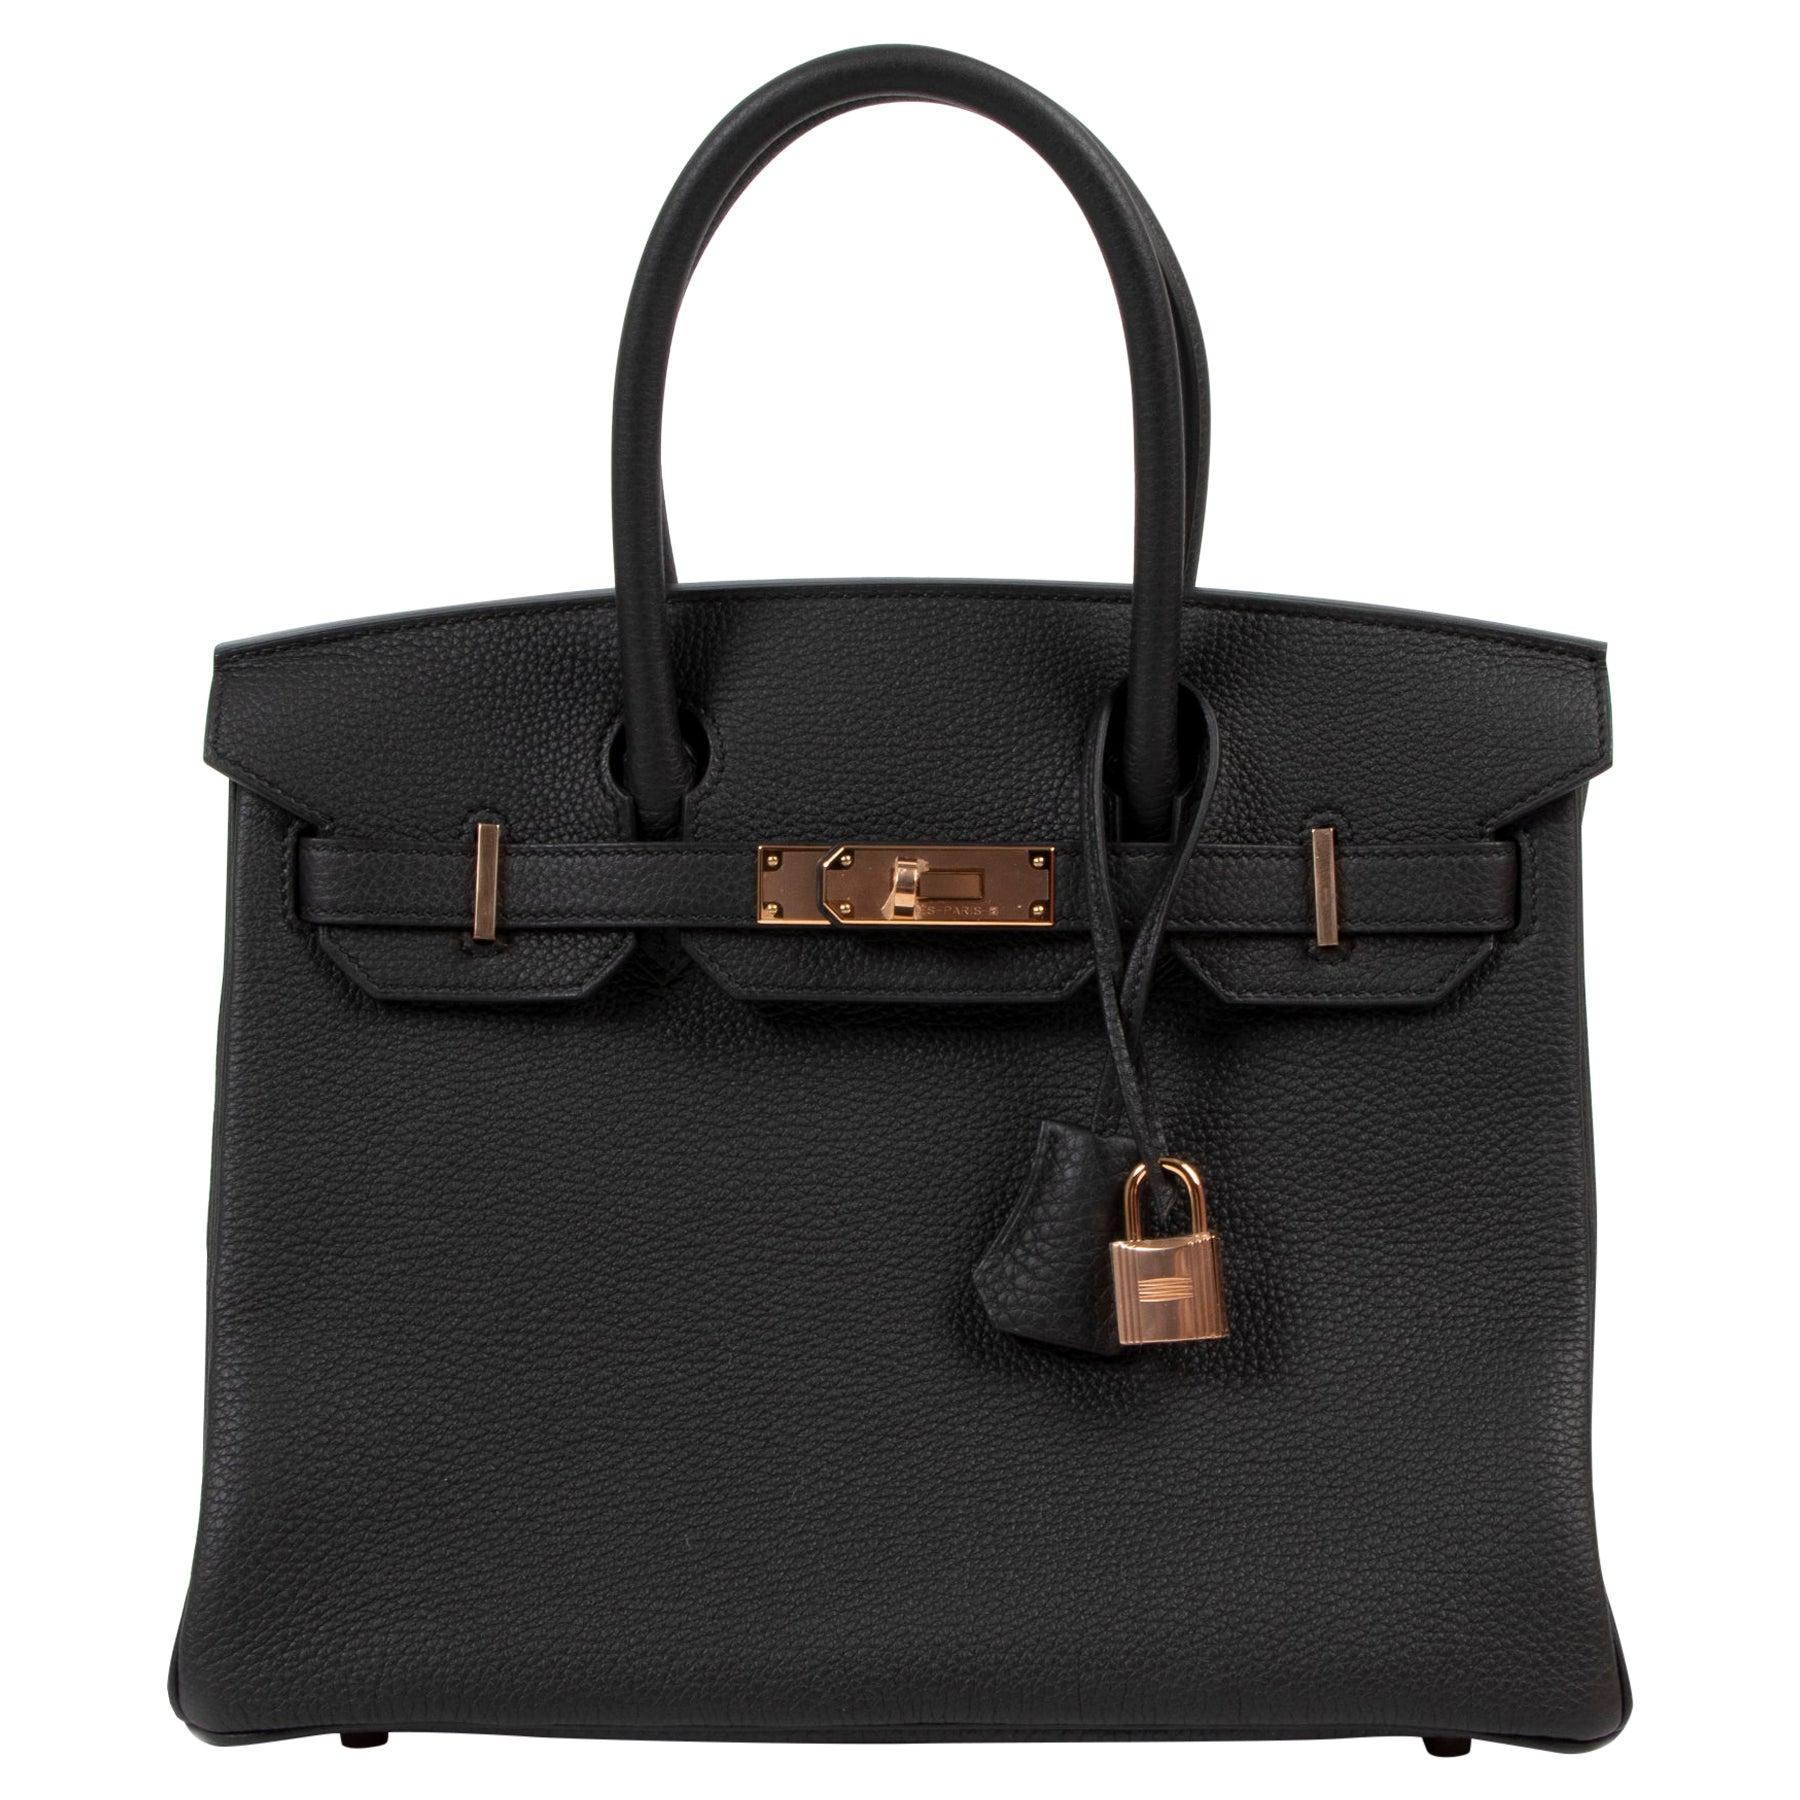 *RARE*Never Used Hermès Birkin 30 Black Togo RHW